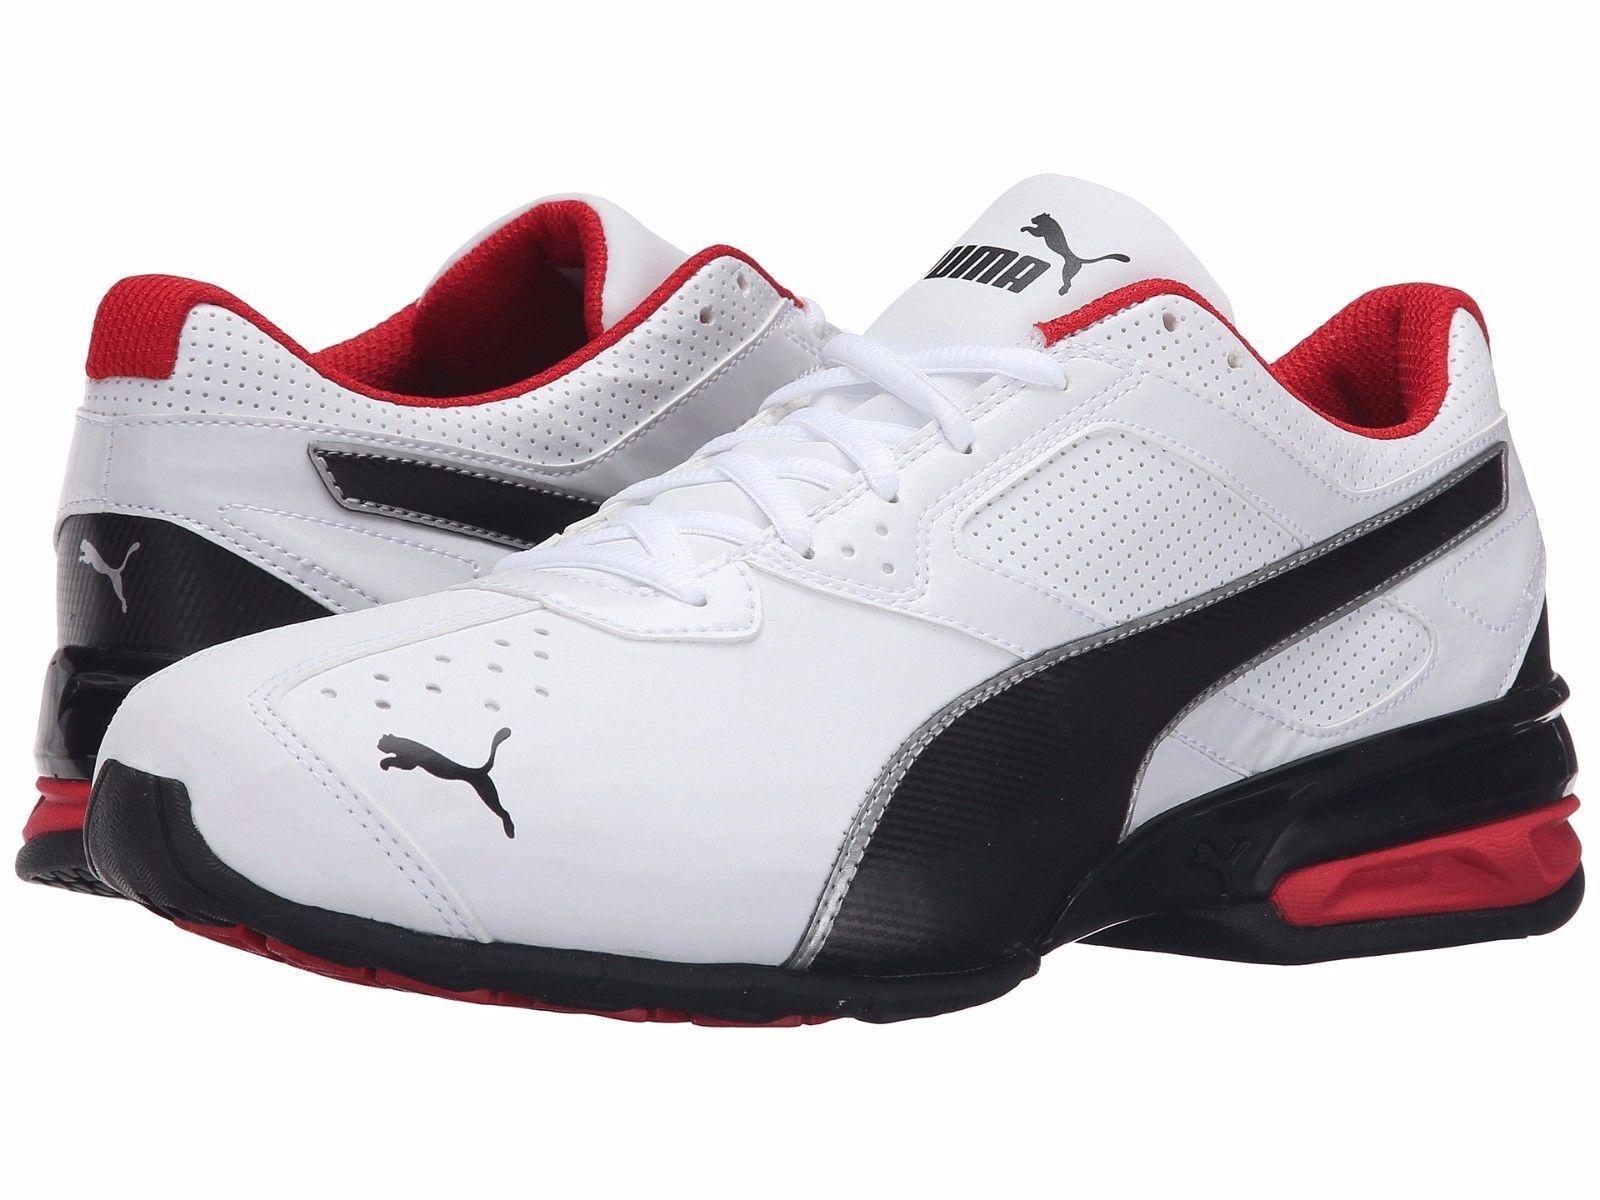 Mens Puma Tazon 6 FM Running shoes White   Black   Silver   Red Sz 11.5 18987302